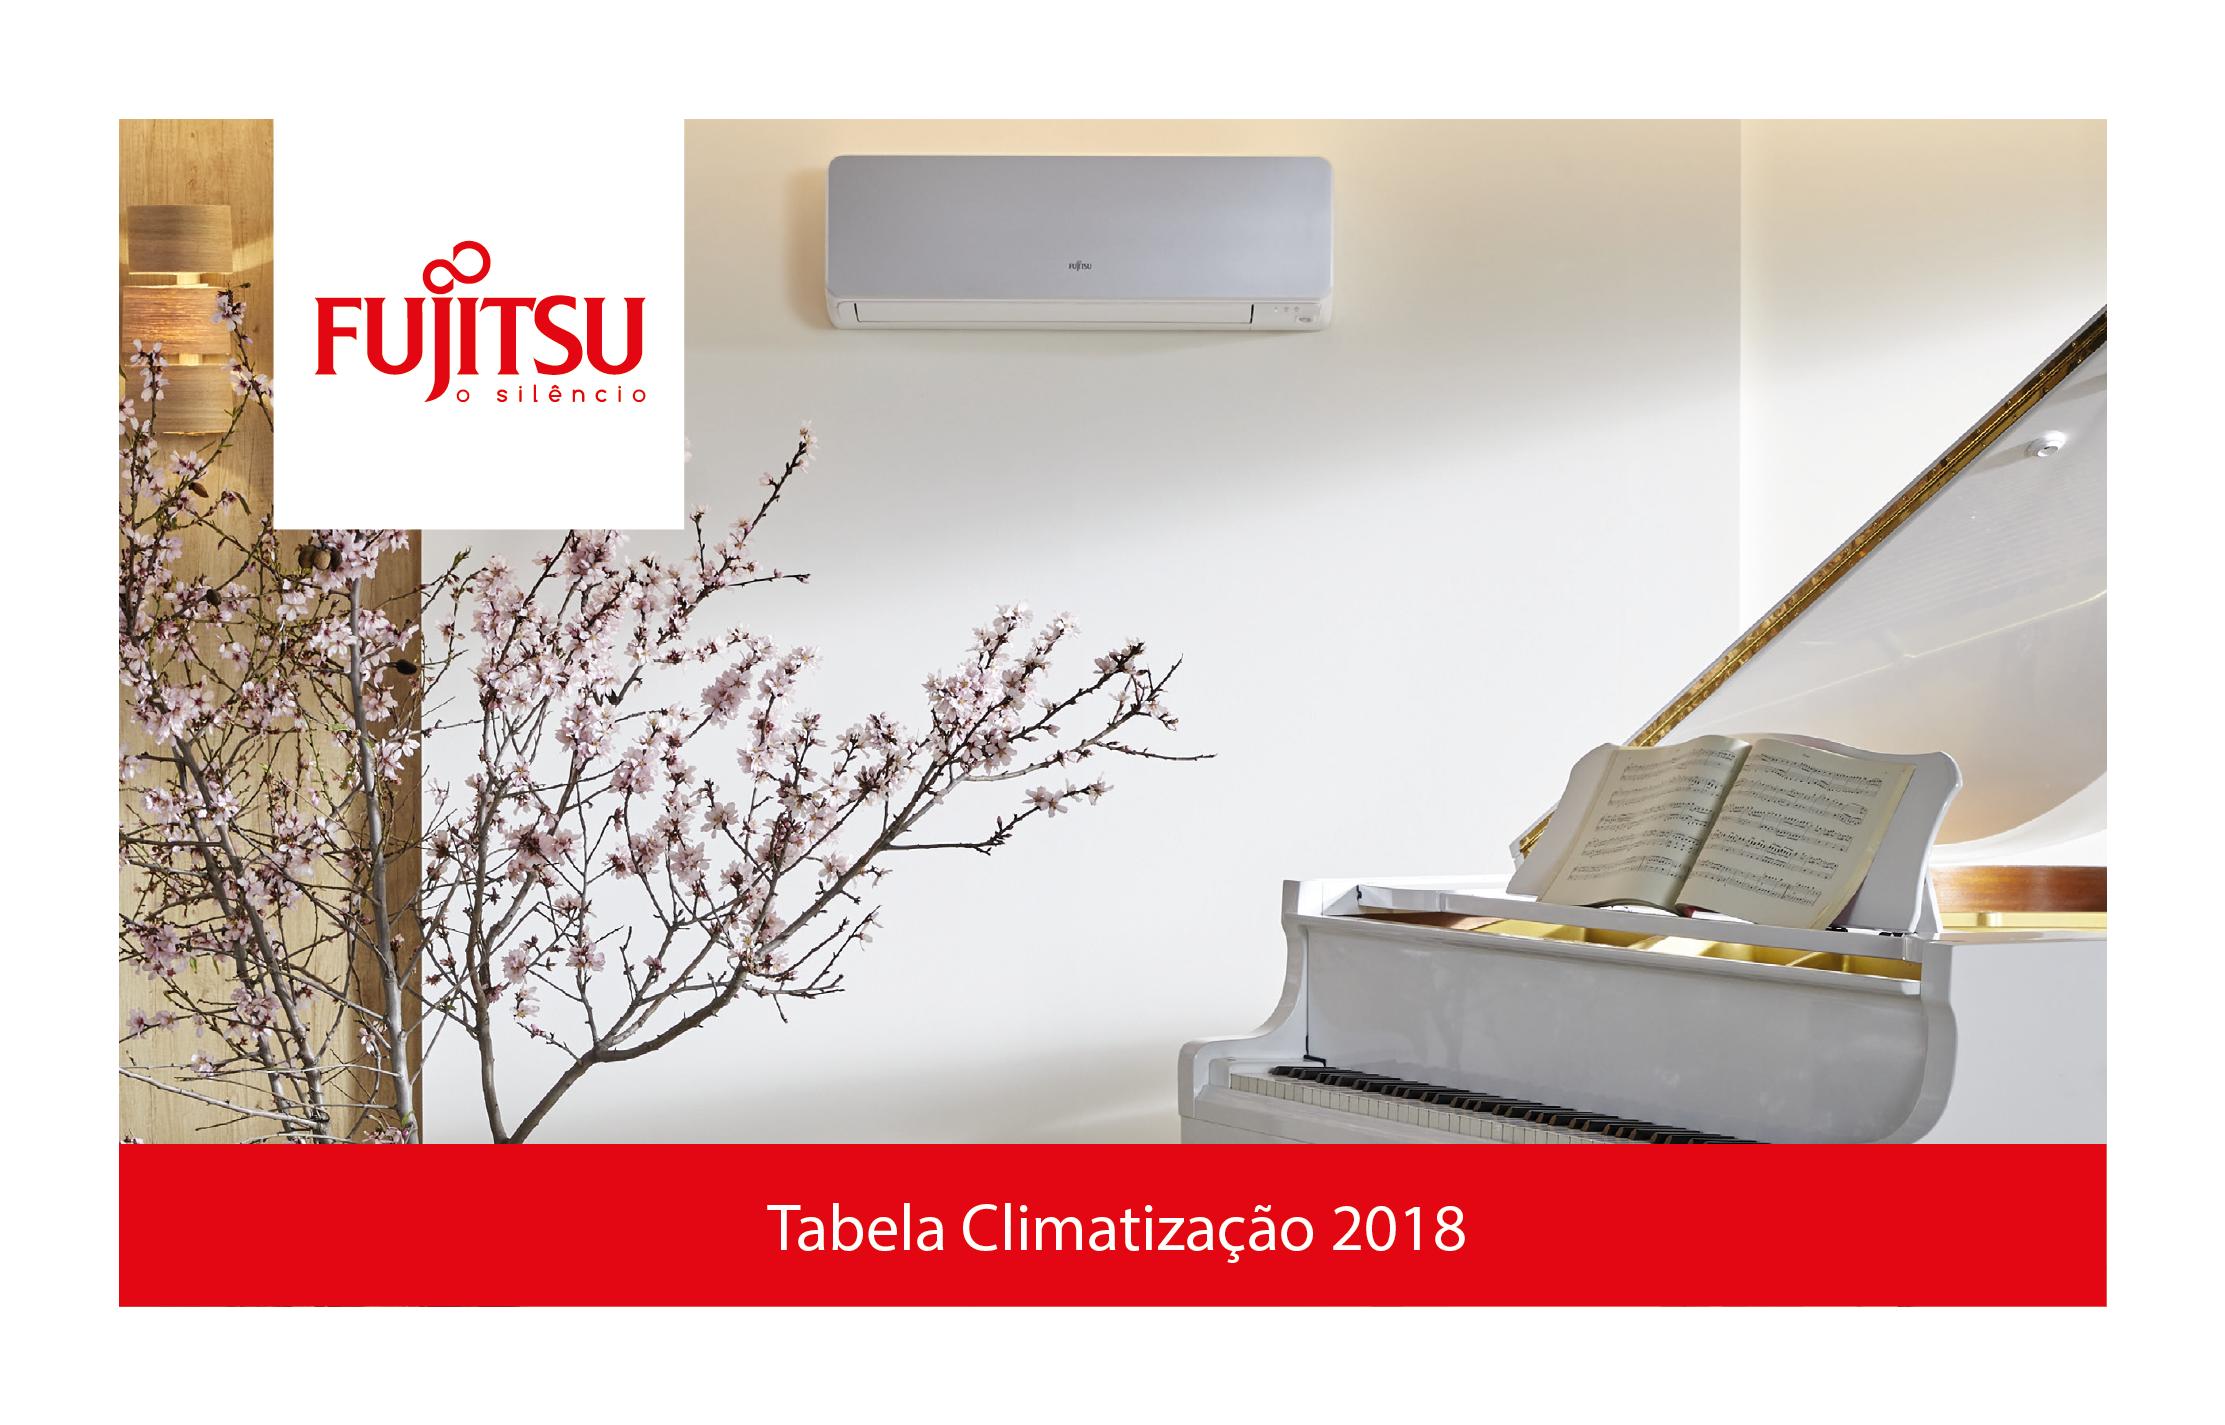 img_fujitsu_tabela2018_Mesa de trabajo 1